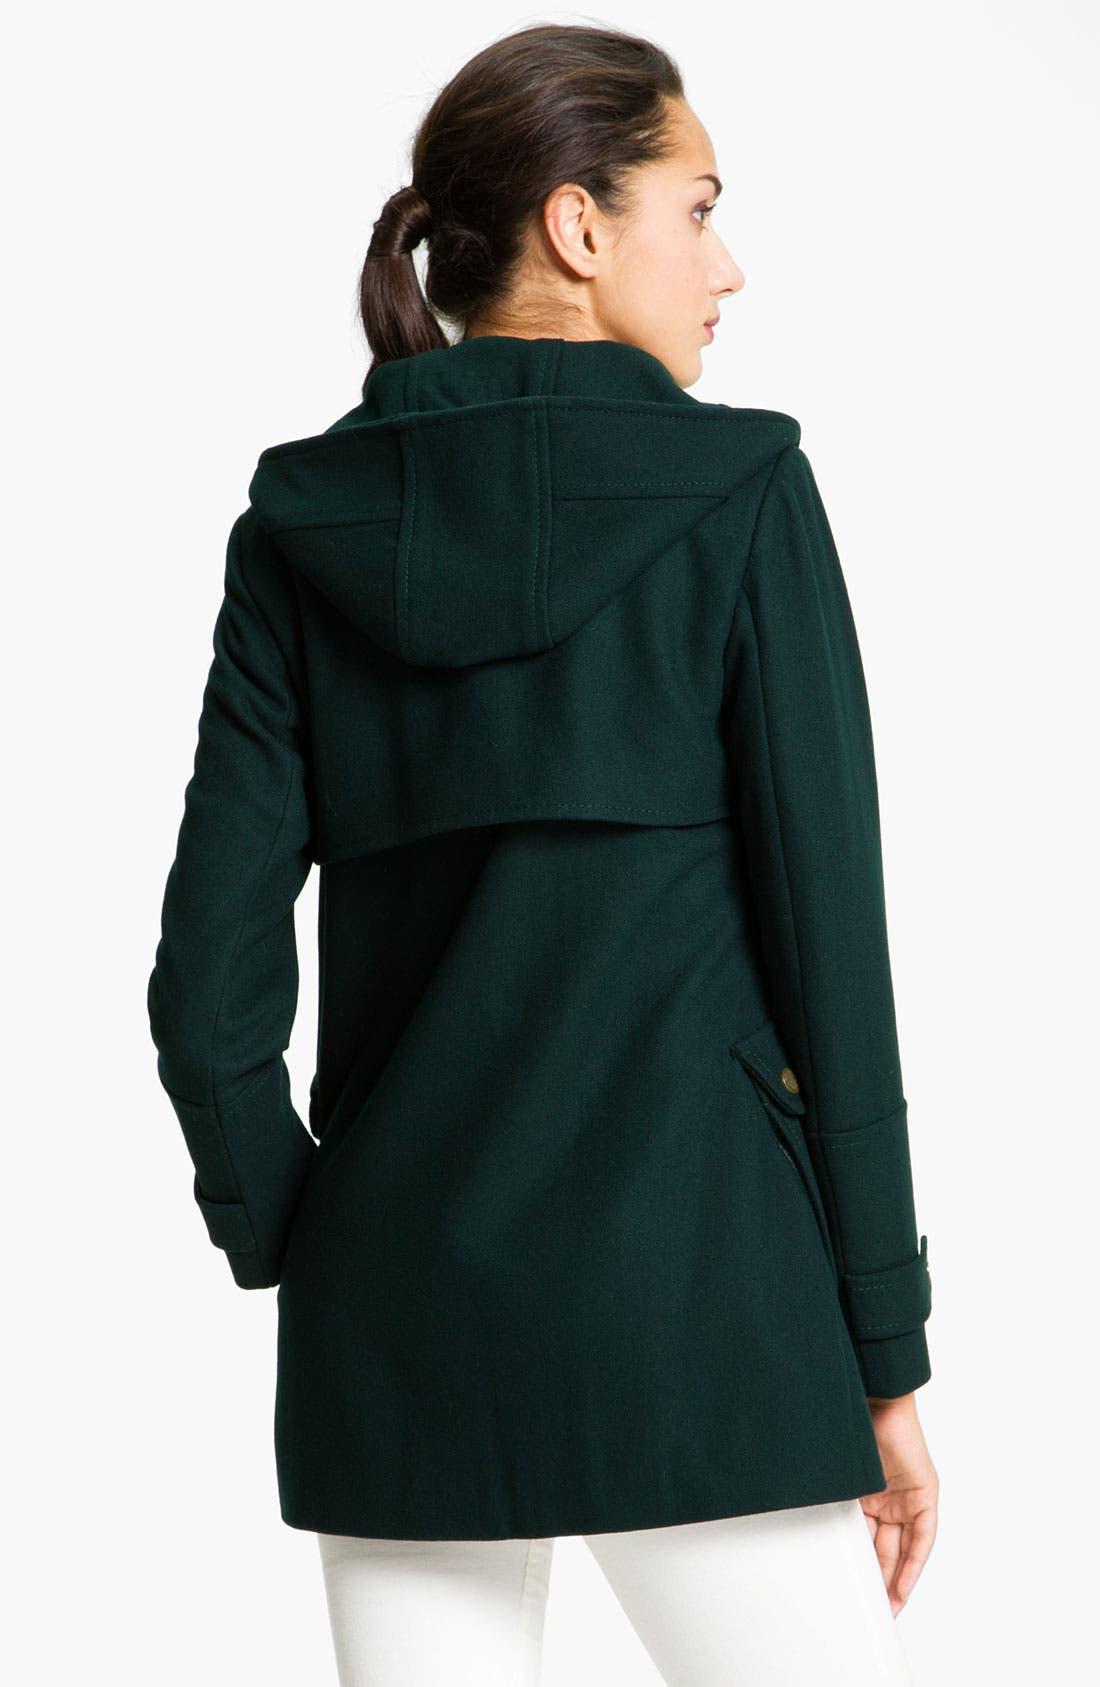 Alternate Image 2  - Vince Camuto Wool Blend Jacket with Detachable Hood (Petite)